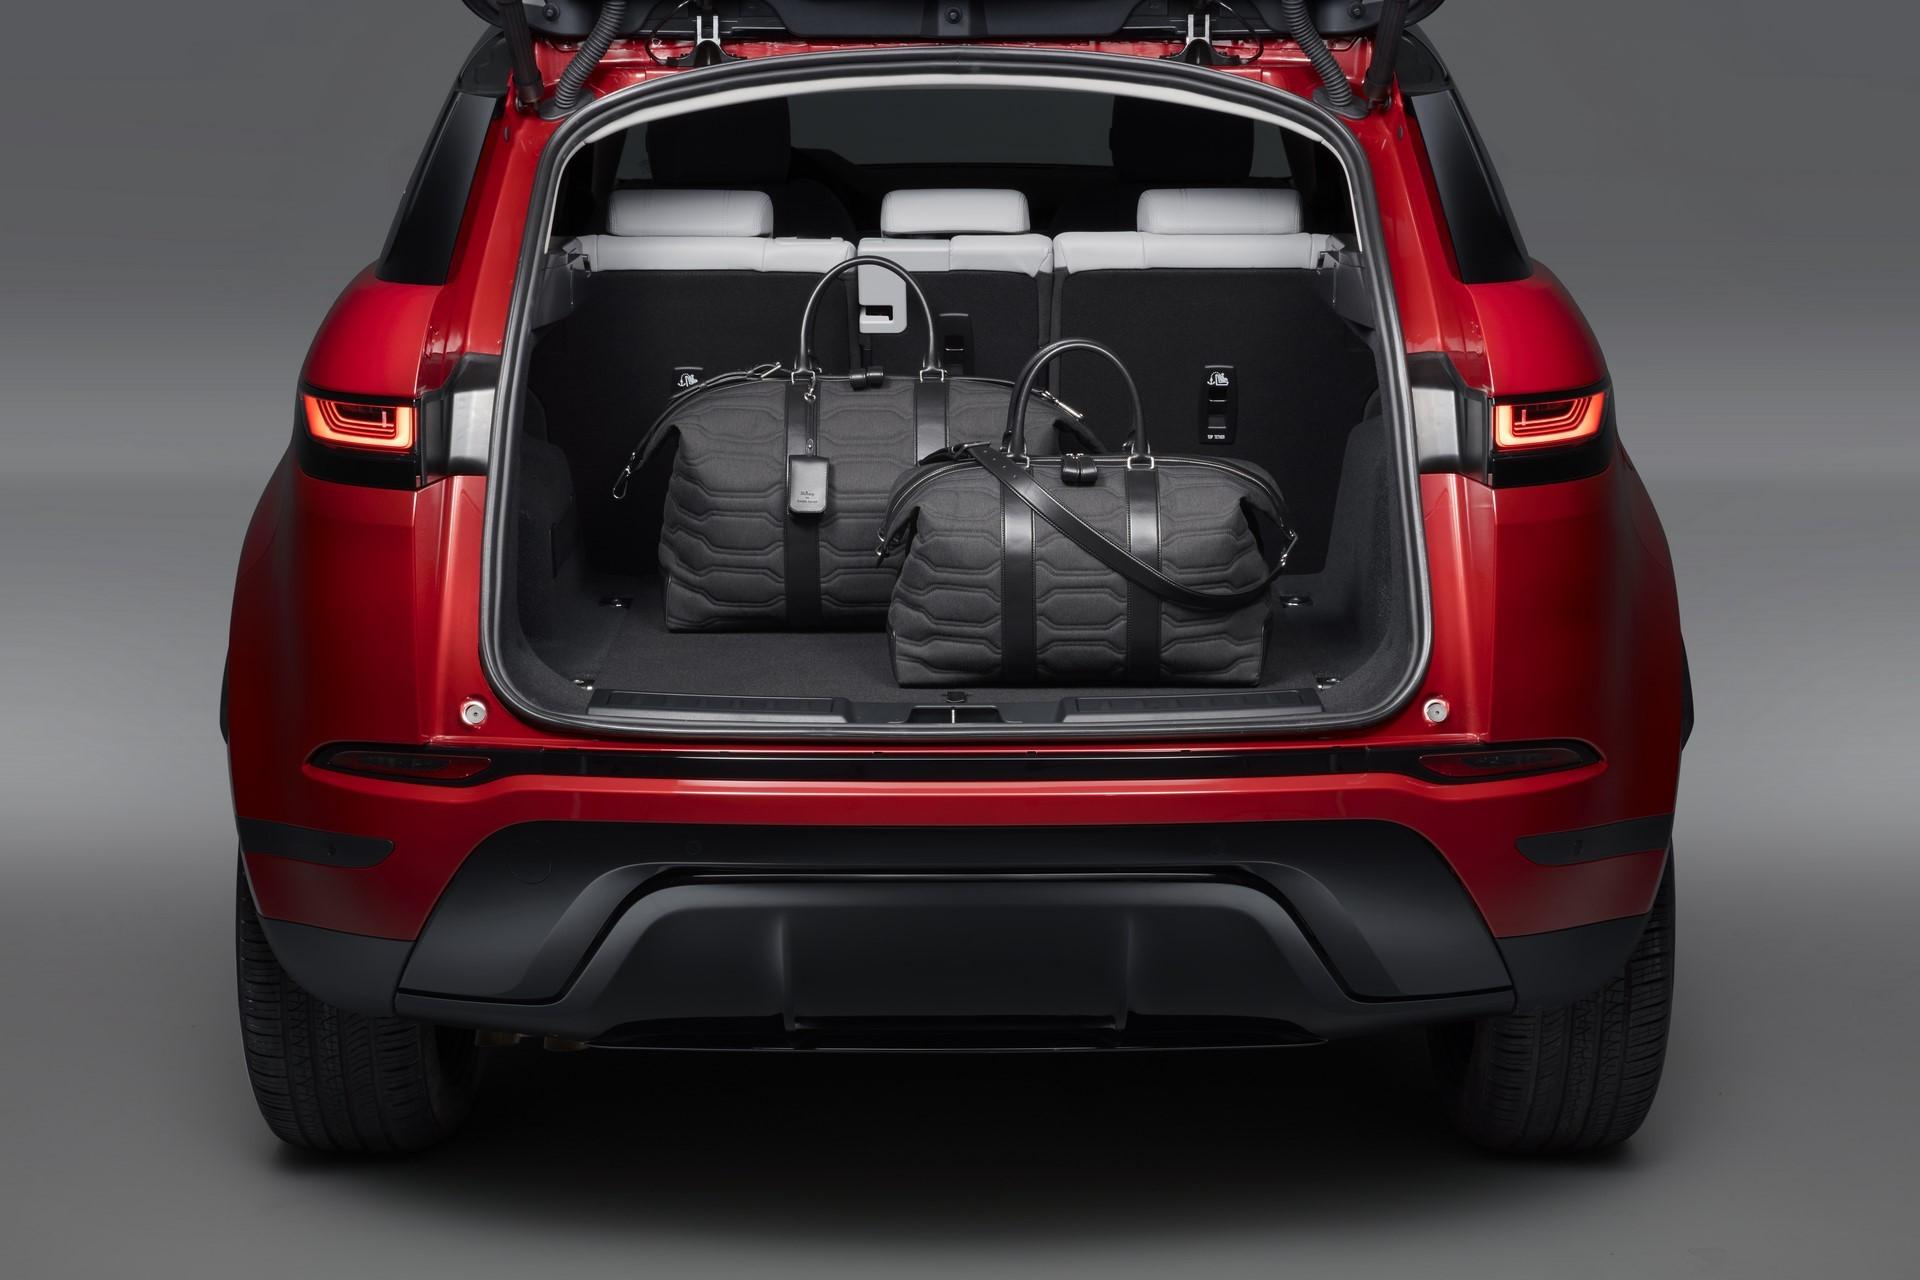 Range Rover Evoque 2019 (84)